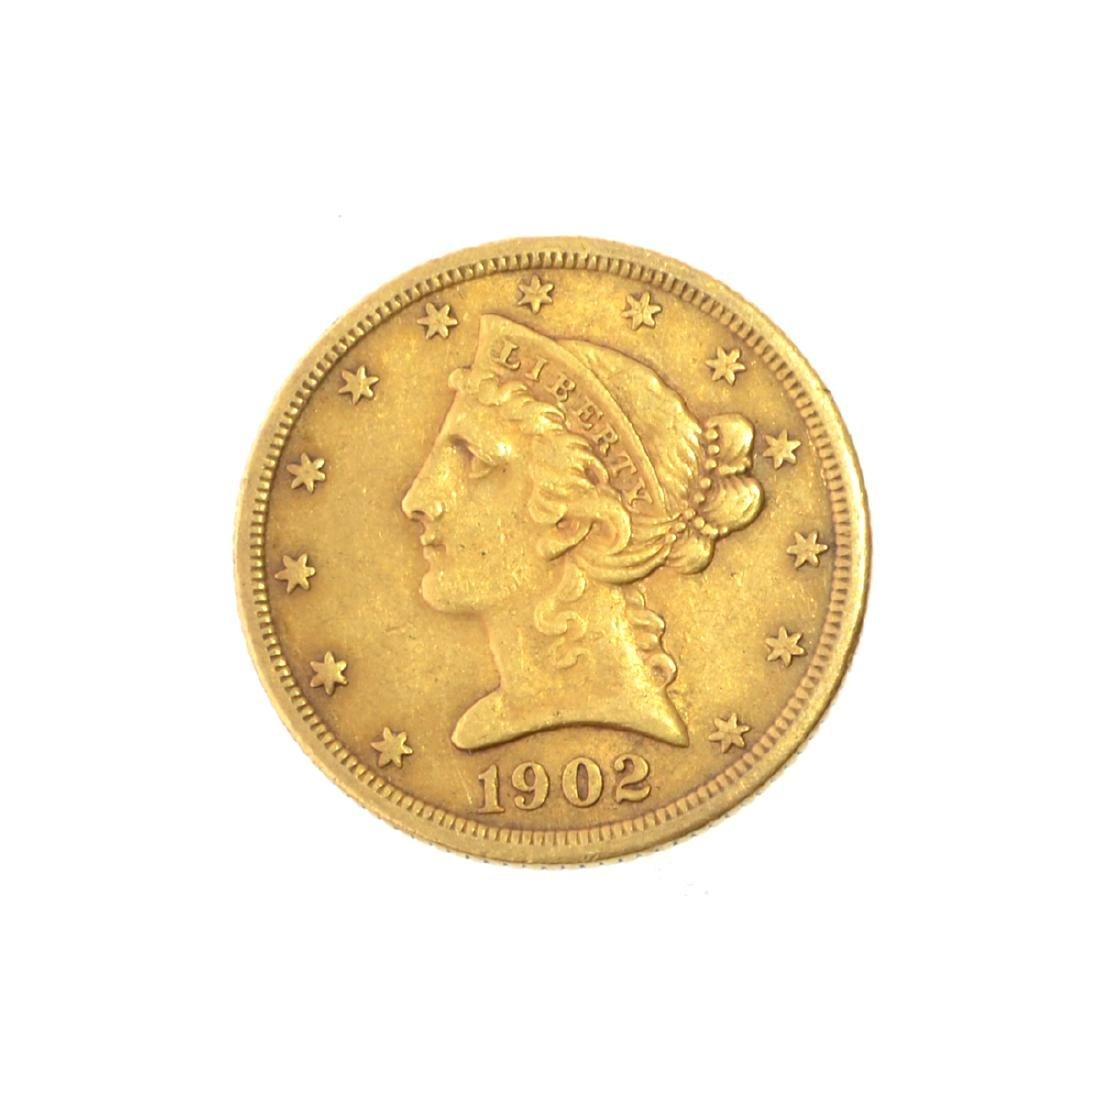 *1902 $5 U.S. Liberty Head Gold Coin (JG-N)